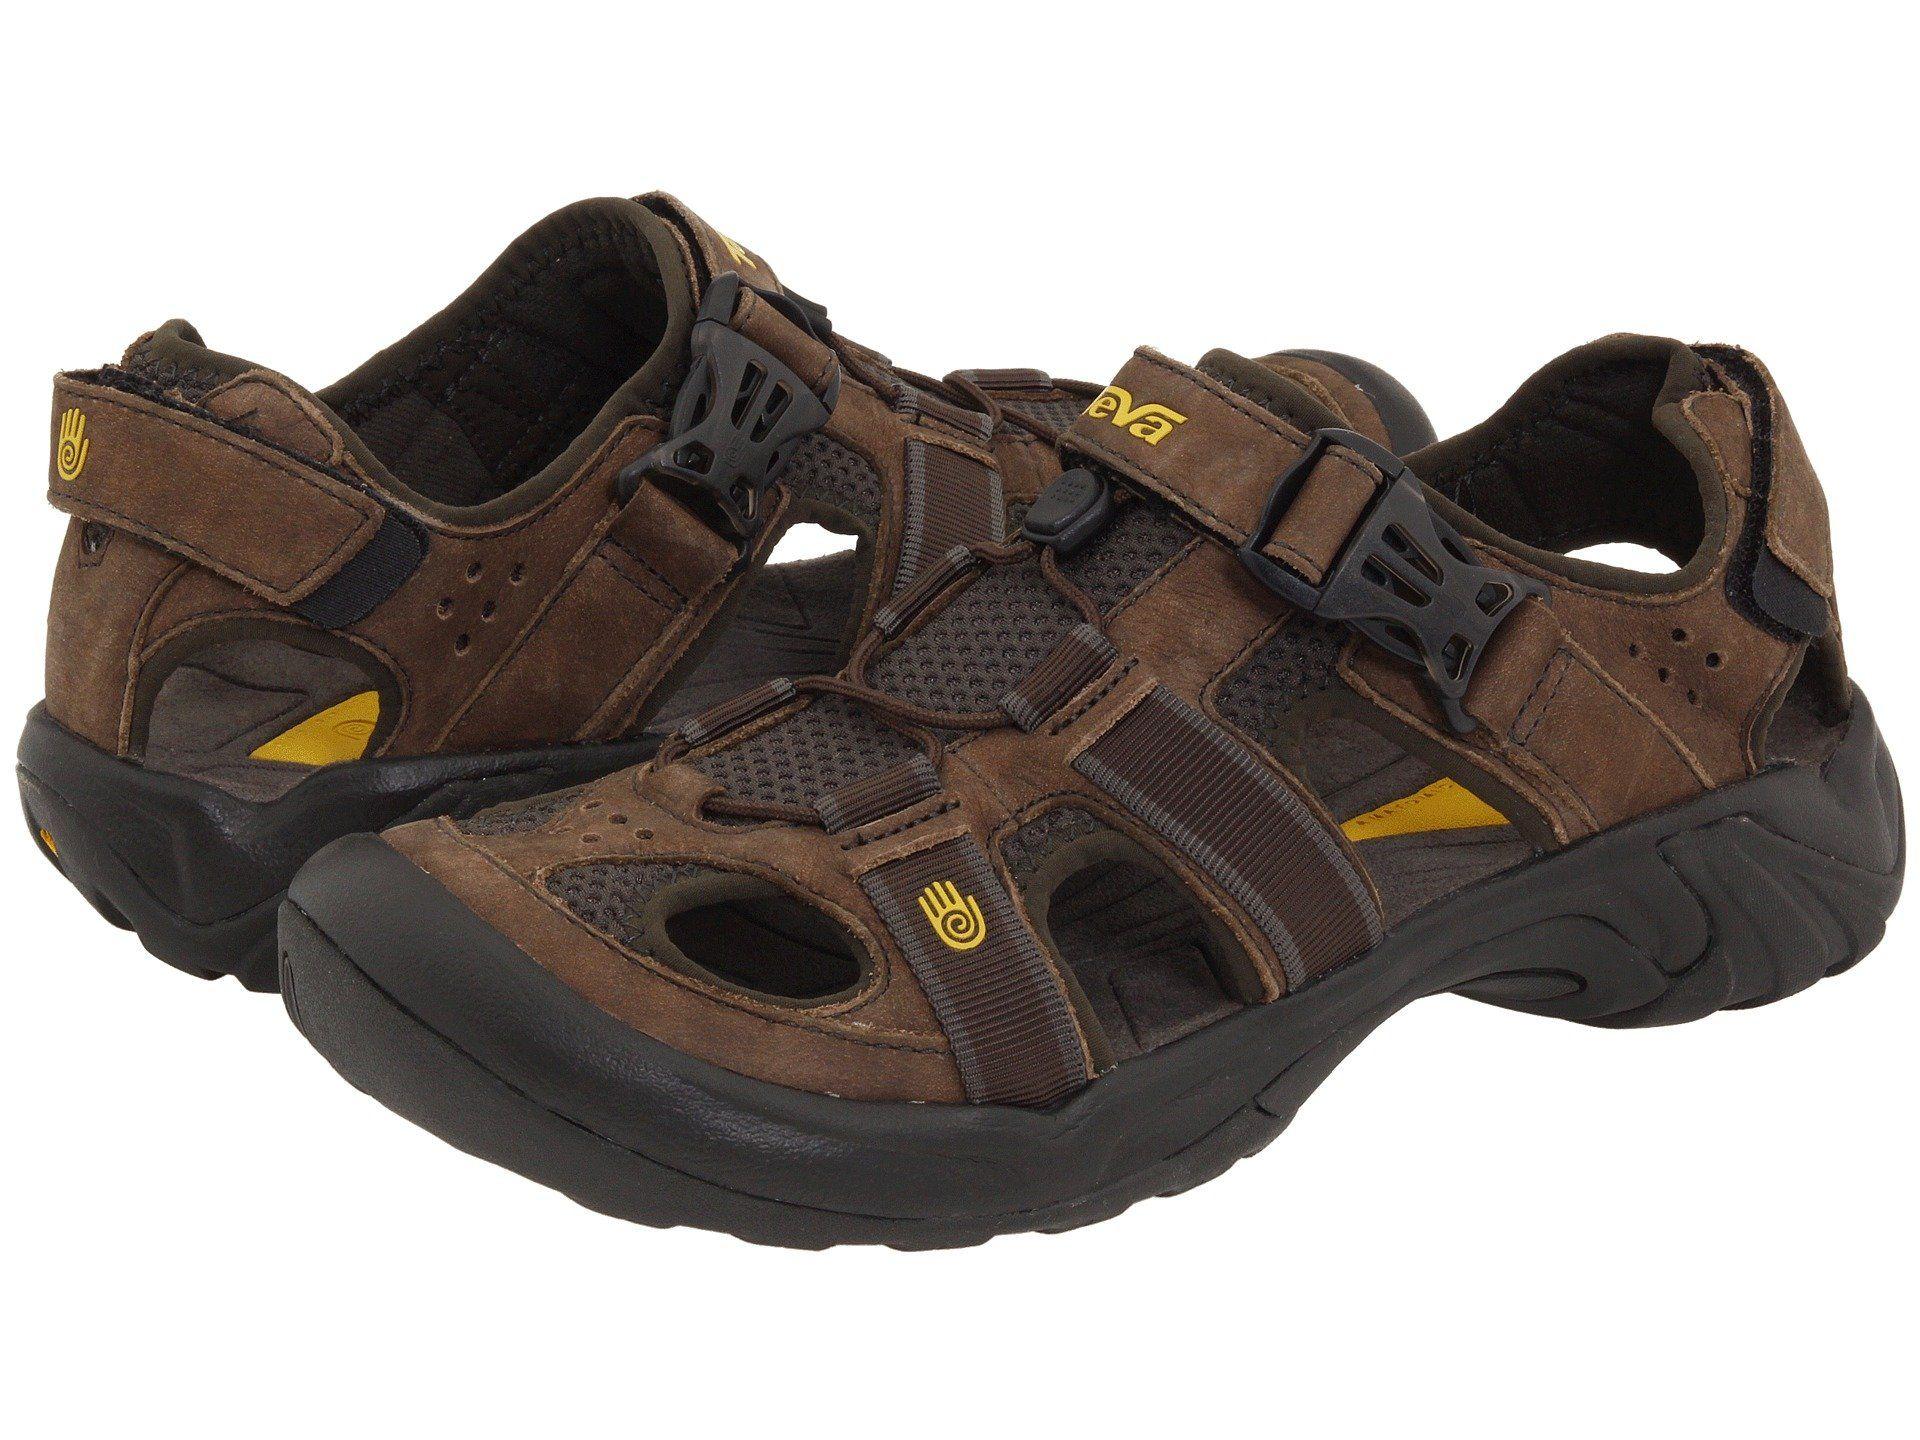 0b03ac7858af1 TEVA Omnium Leather.  teva  shoes